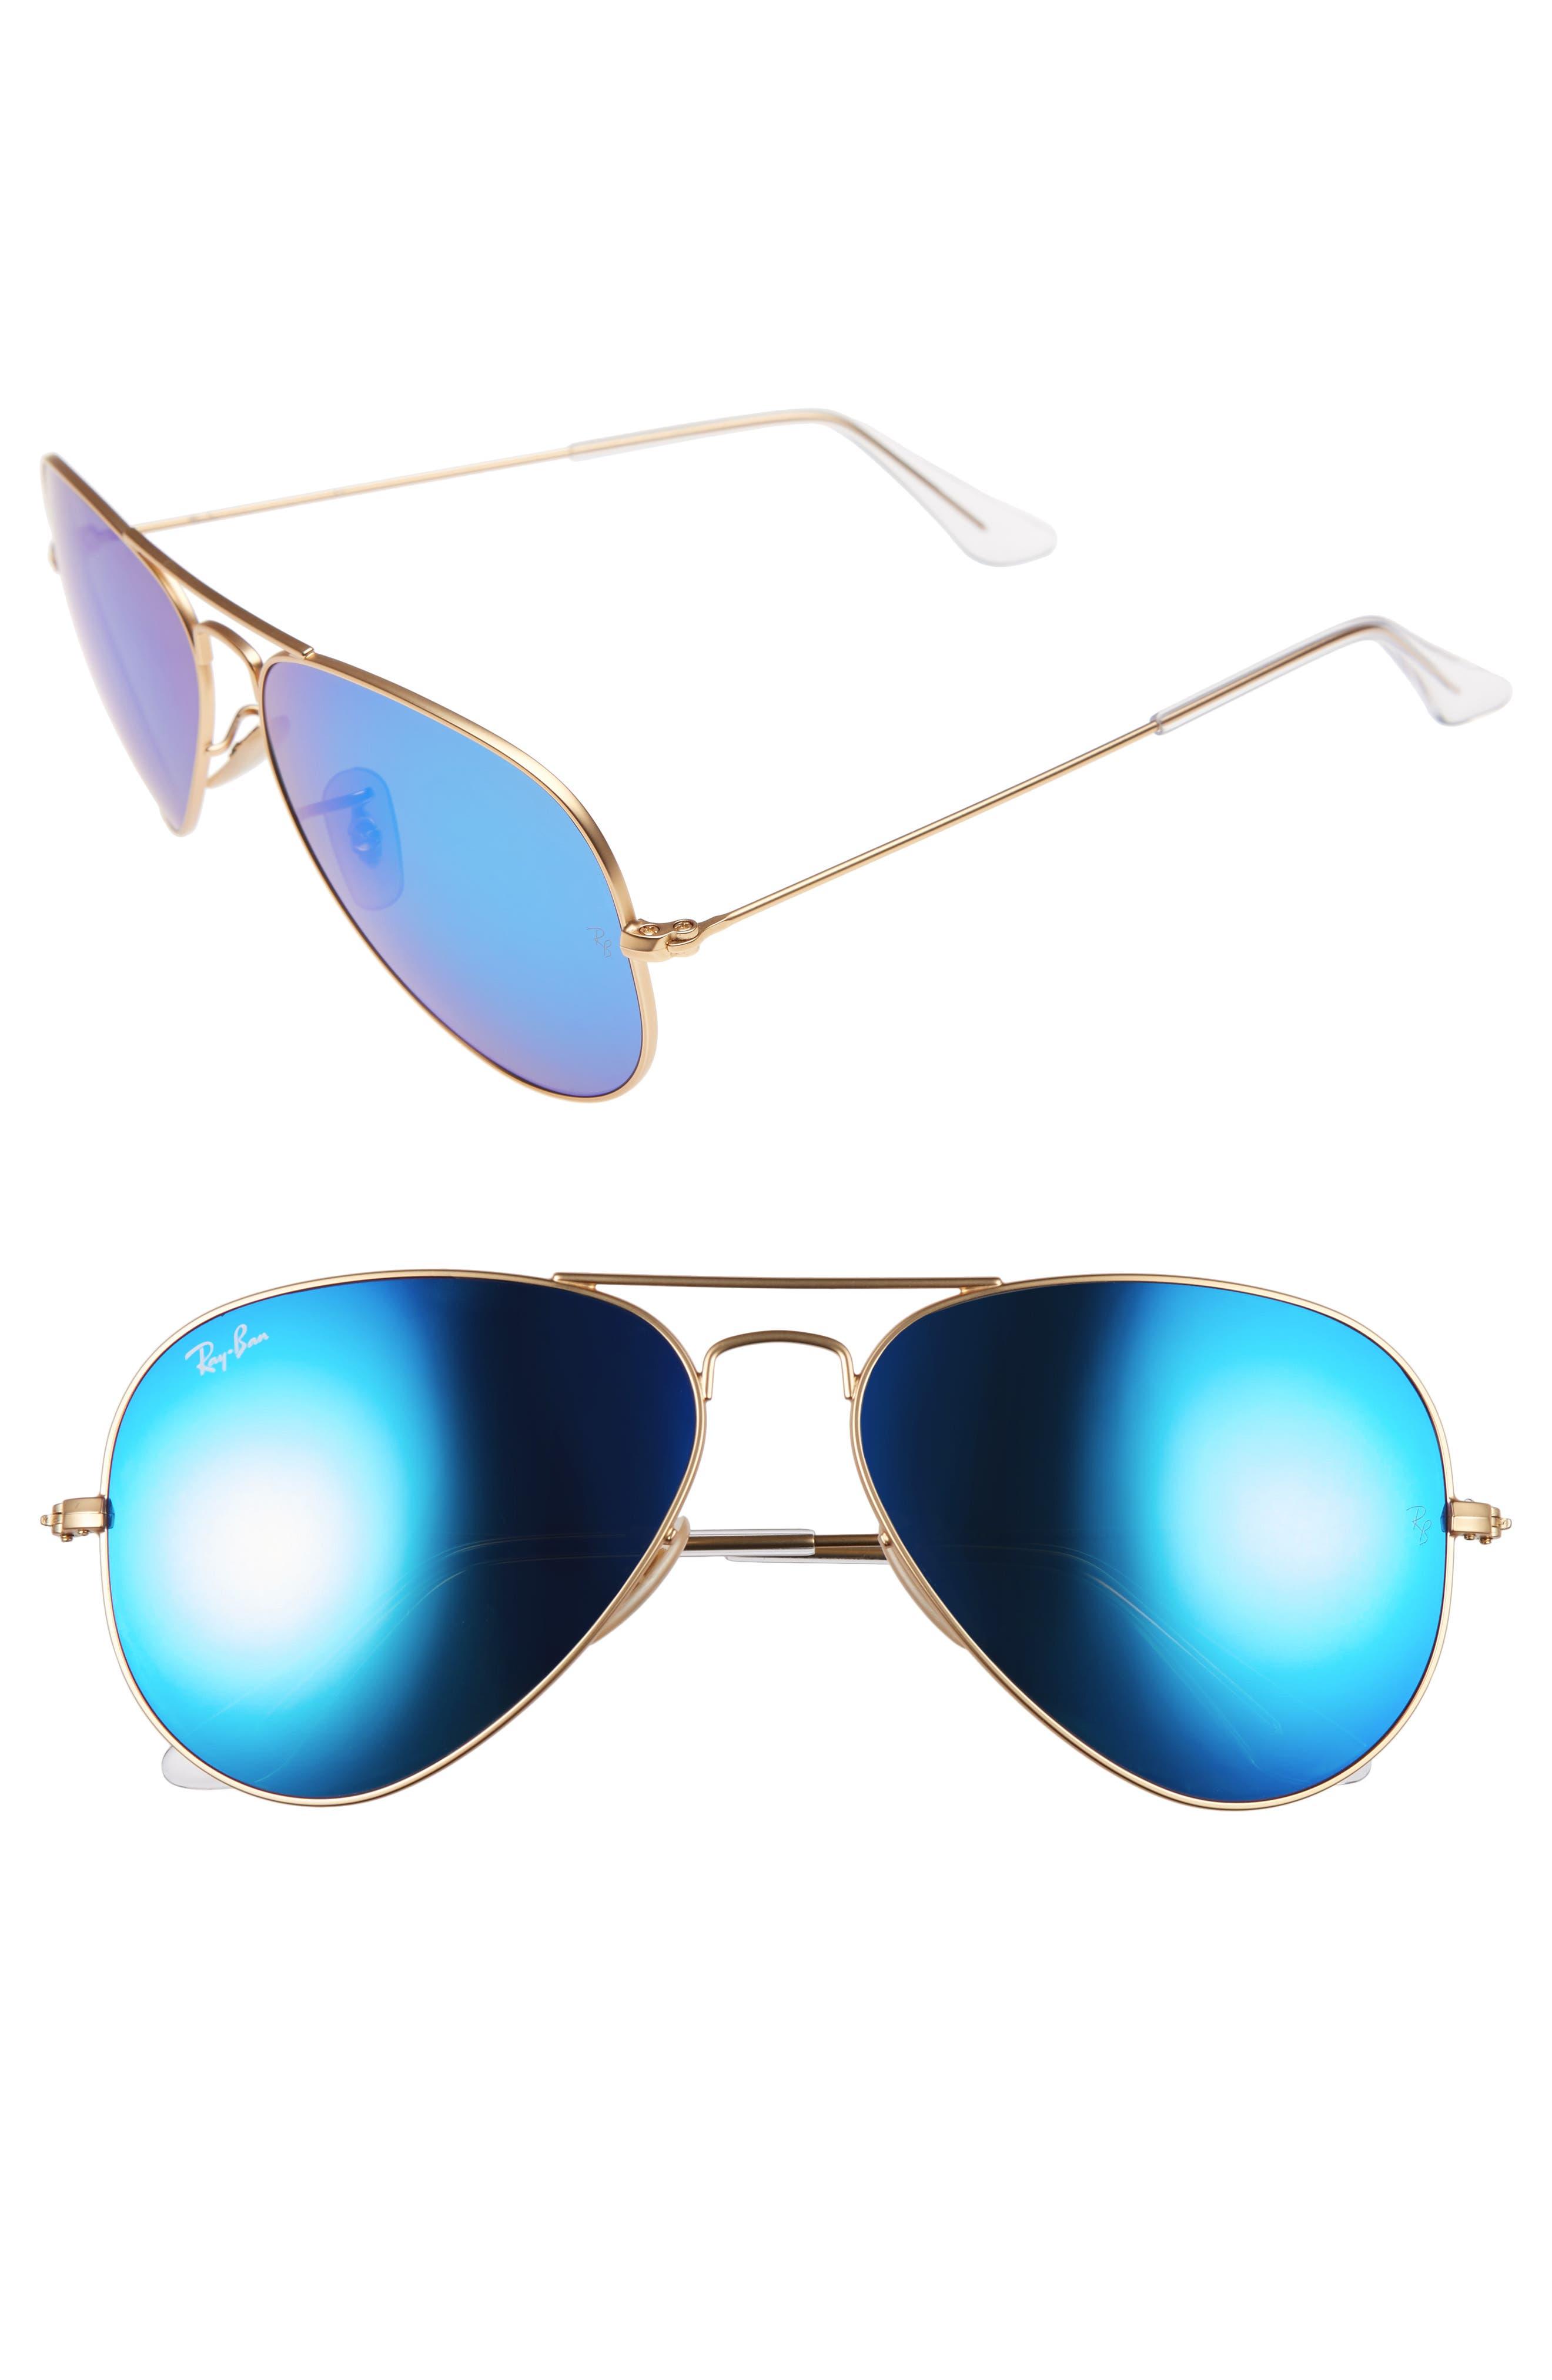 Ray-Ban Original Aviator 5m Sunglasses - Matte Gold/ Blue Mirror